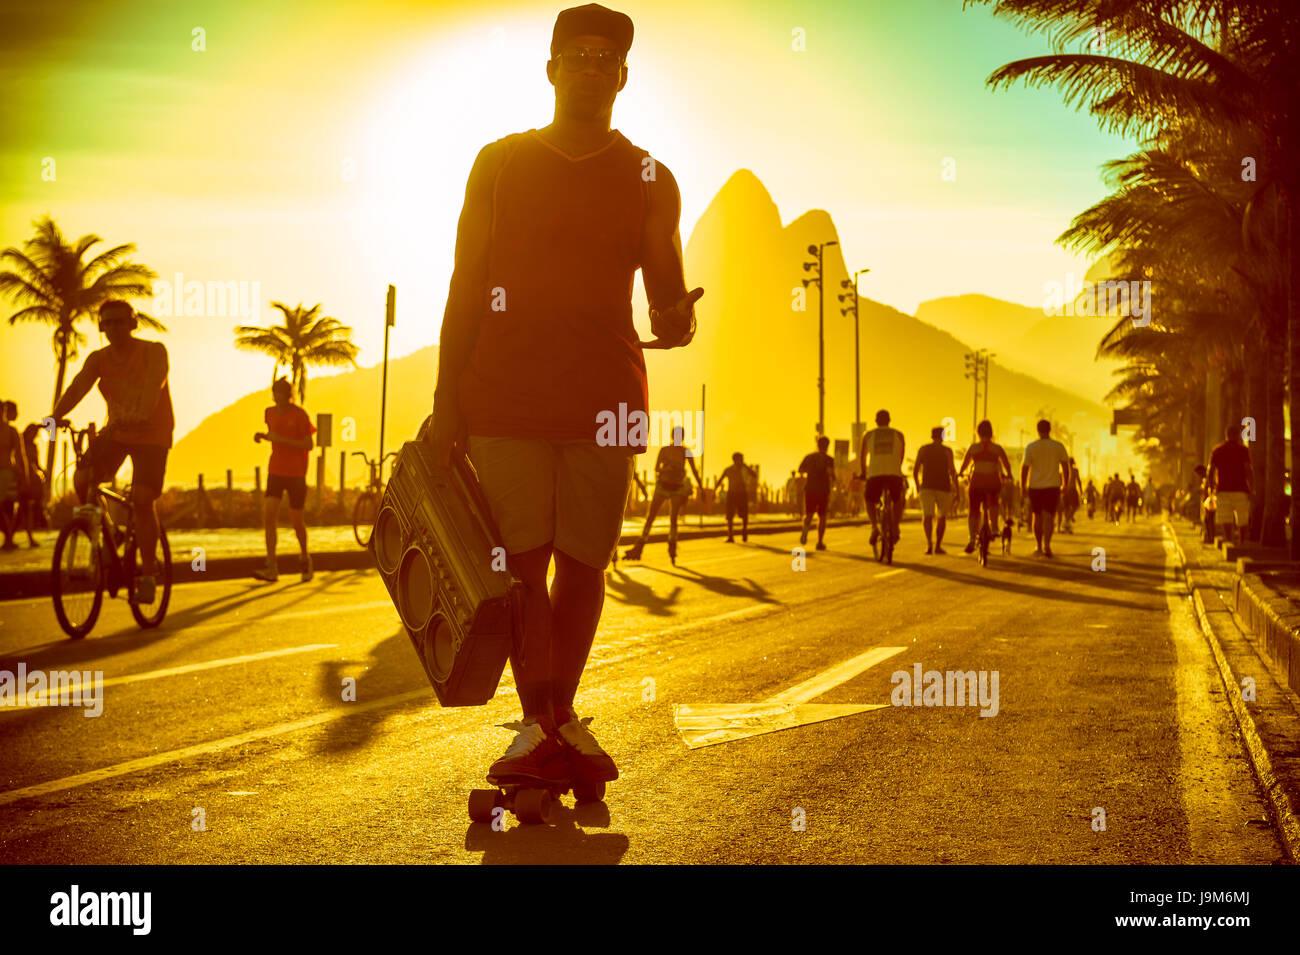 Silueta de hombre brasileño patinar con boombox en la playa de Ipanema en Rio de Janeiro, Brasil Foto de stock